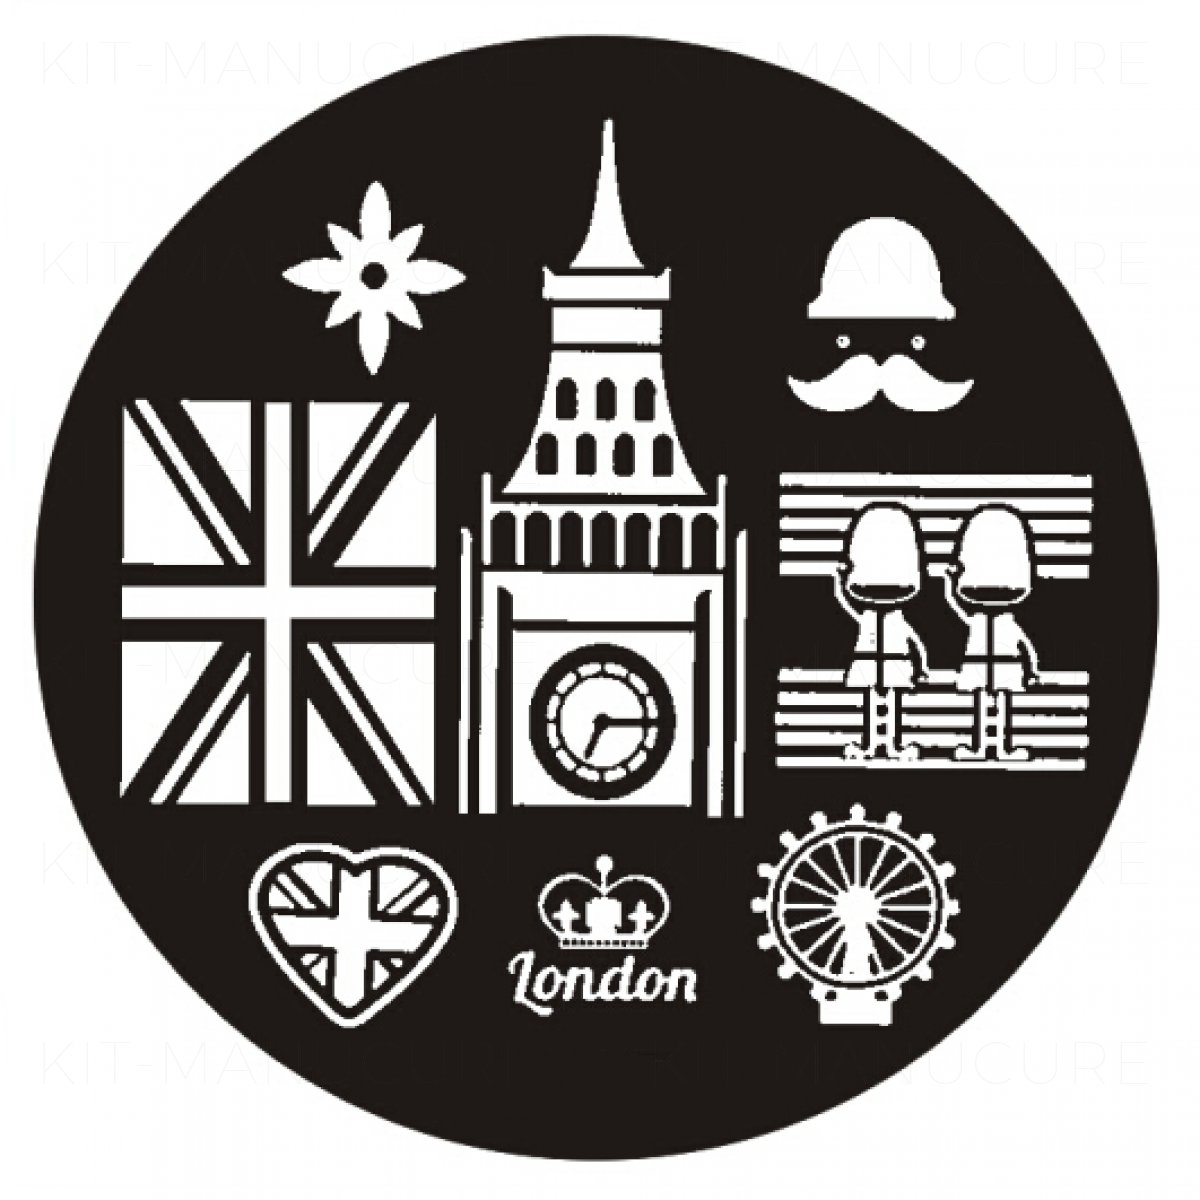 https://www.kit-manucure.com/1064-thickbox_default/plaque-de-stamping-angleterre-drapeau-anglais-big-ben-soldat.jpg